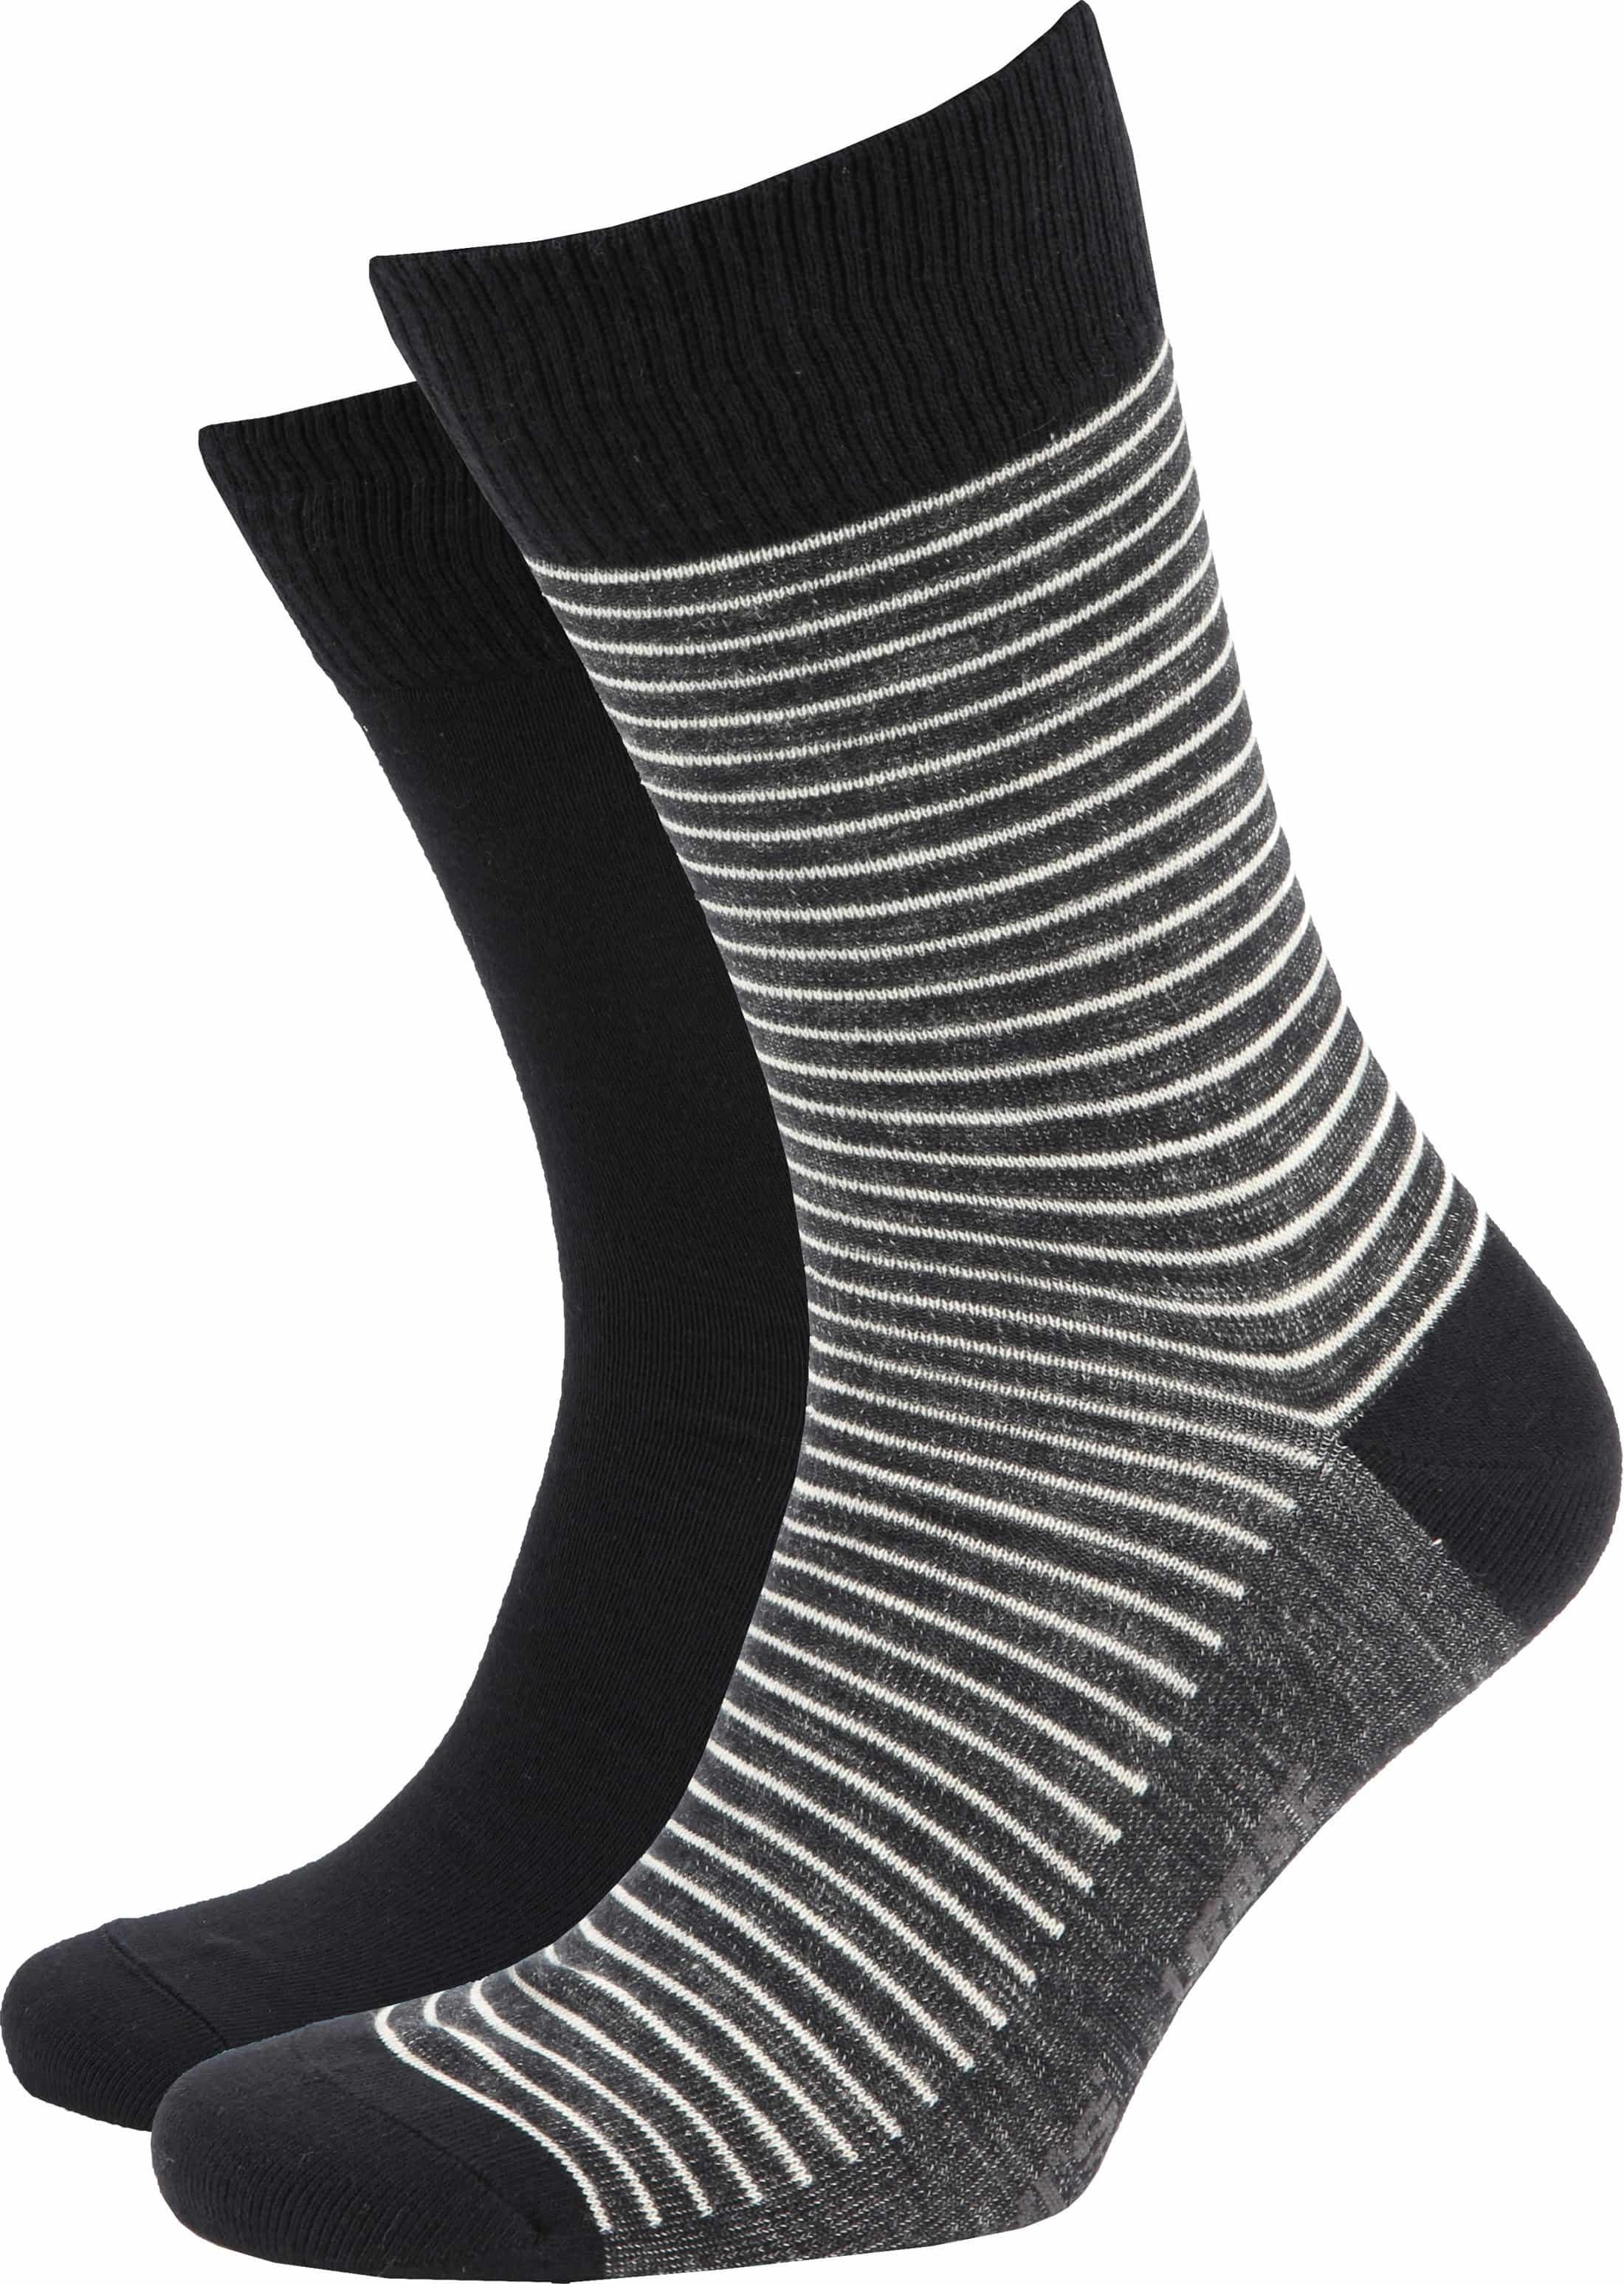 Levi's Socks 2-Pack Black and Dark Grey foto 0